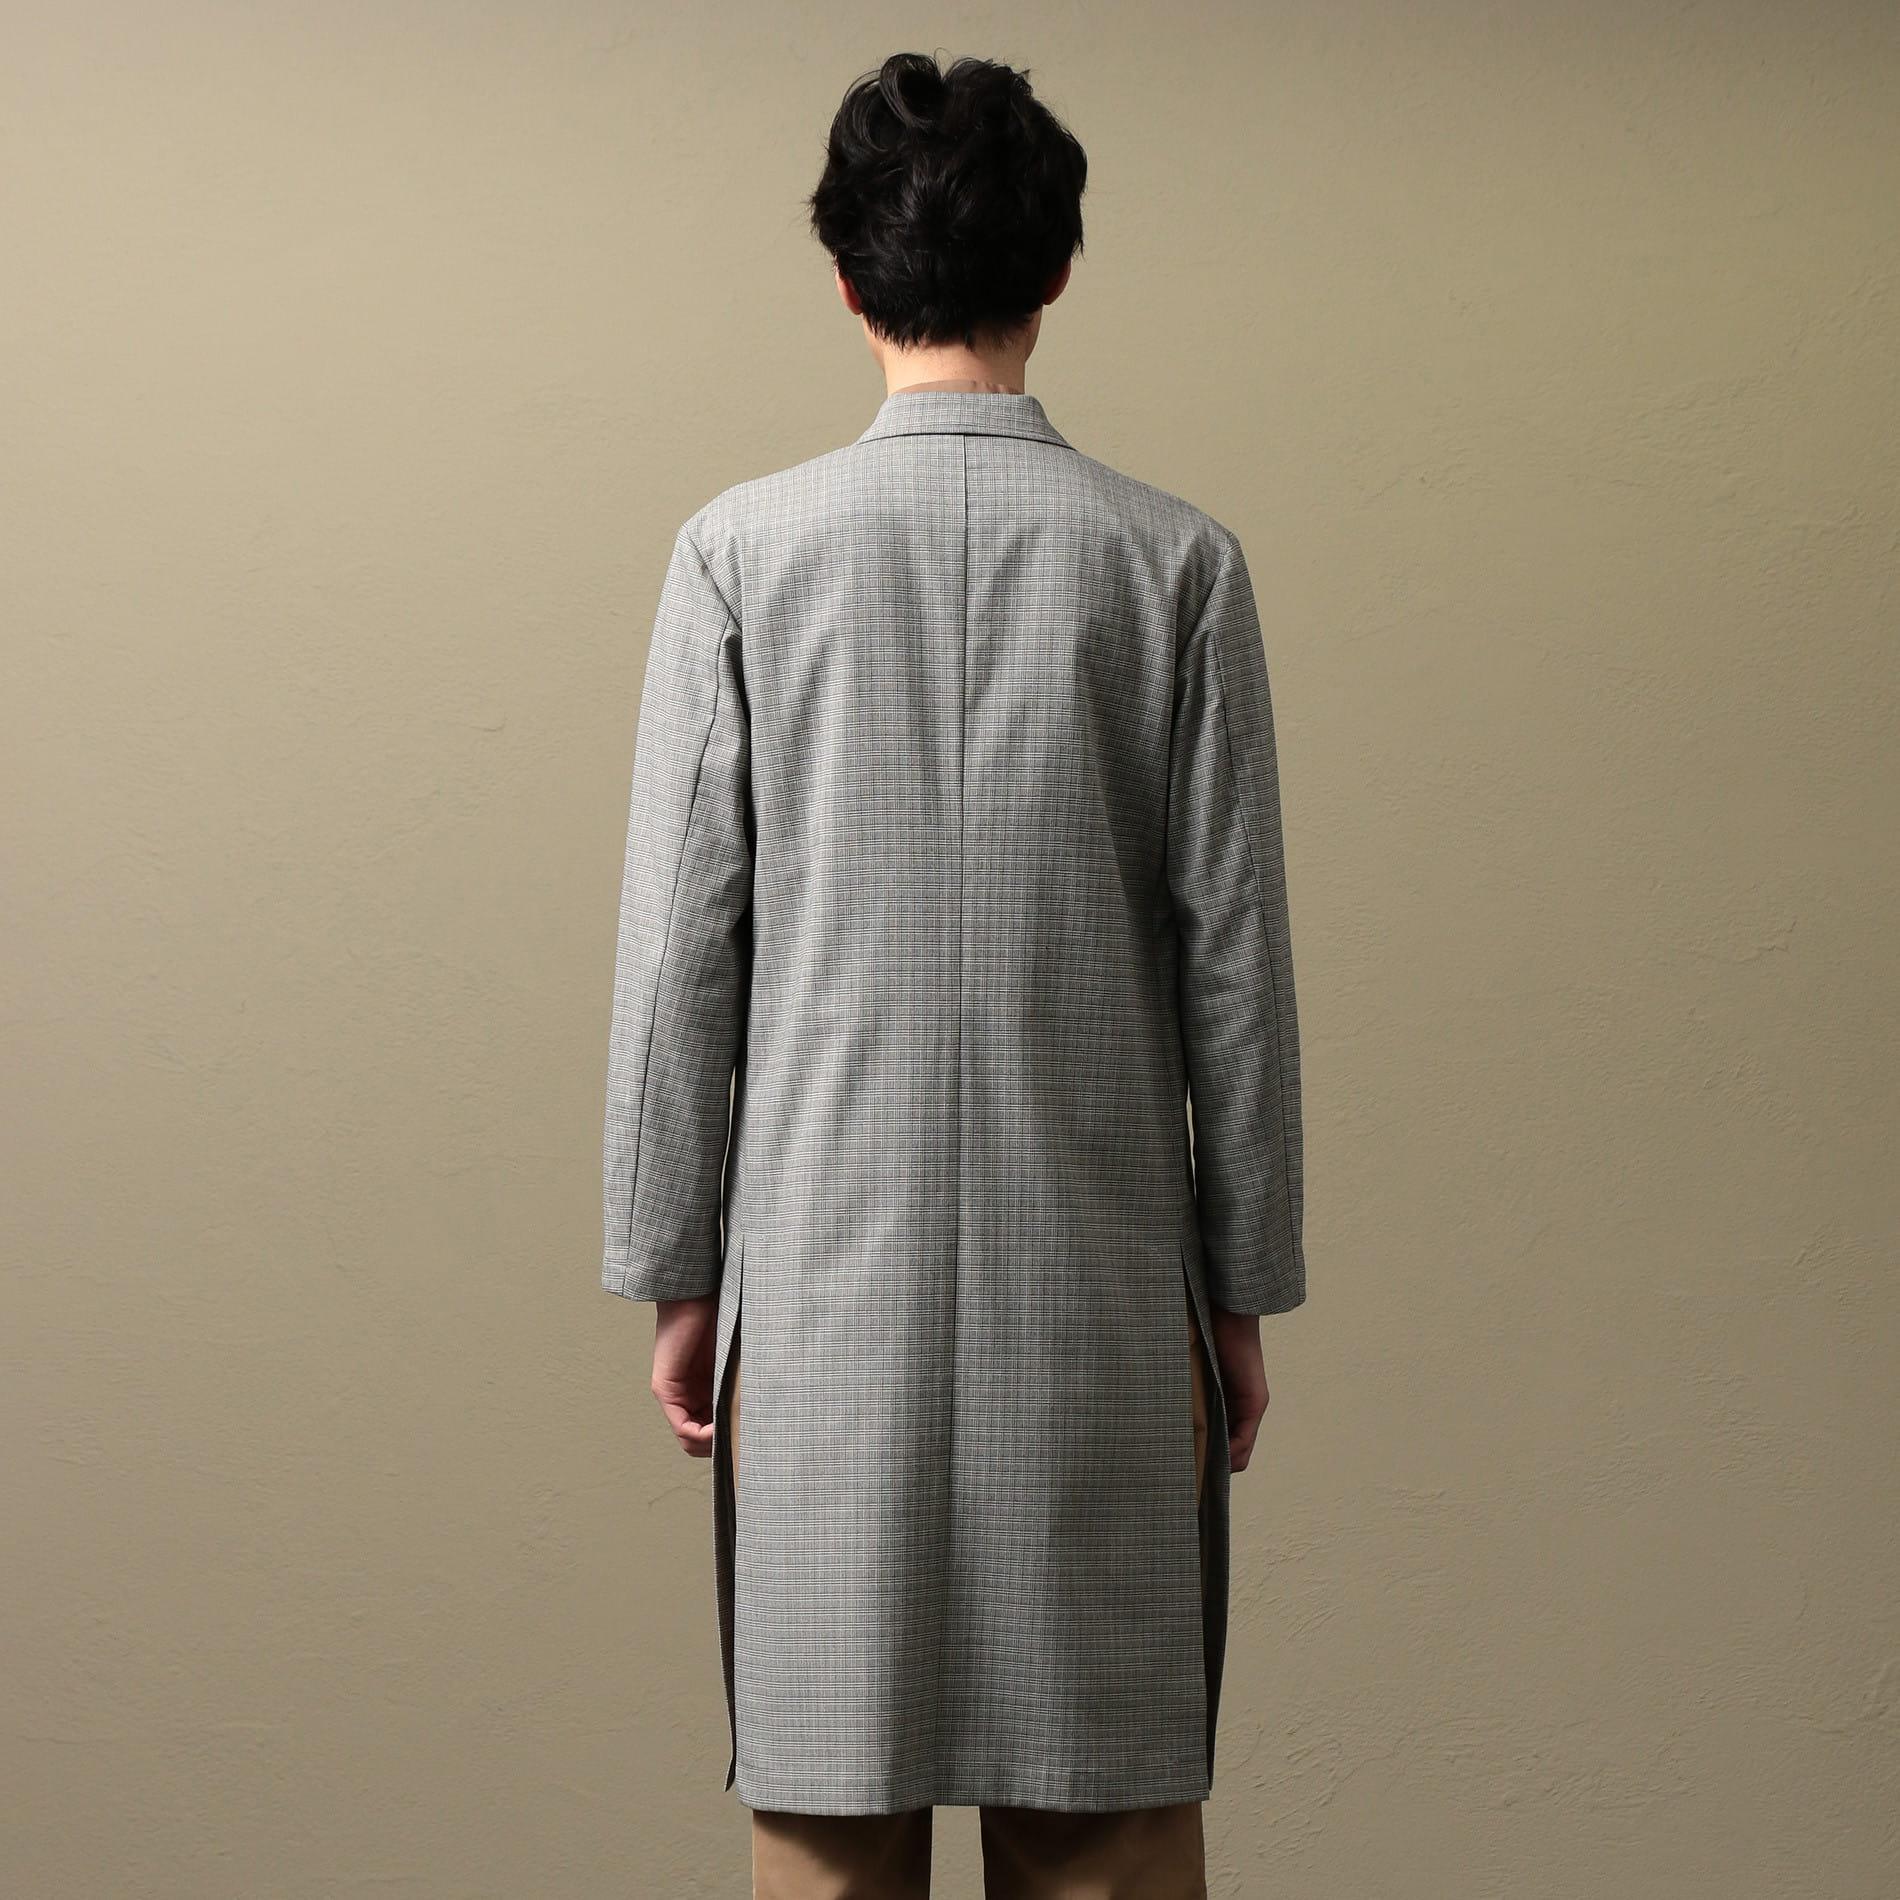 【LF】MEN マイクログレンチェックコート